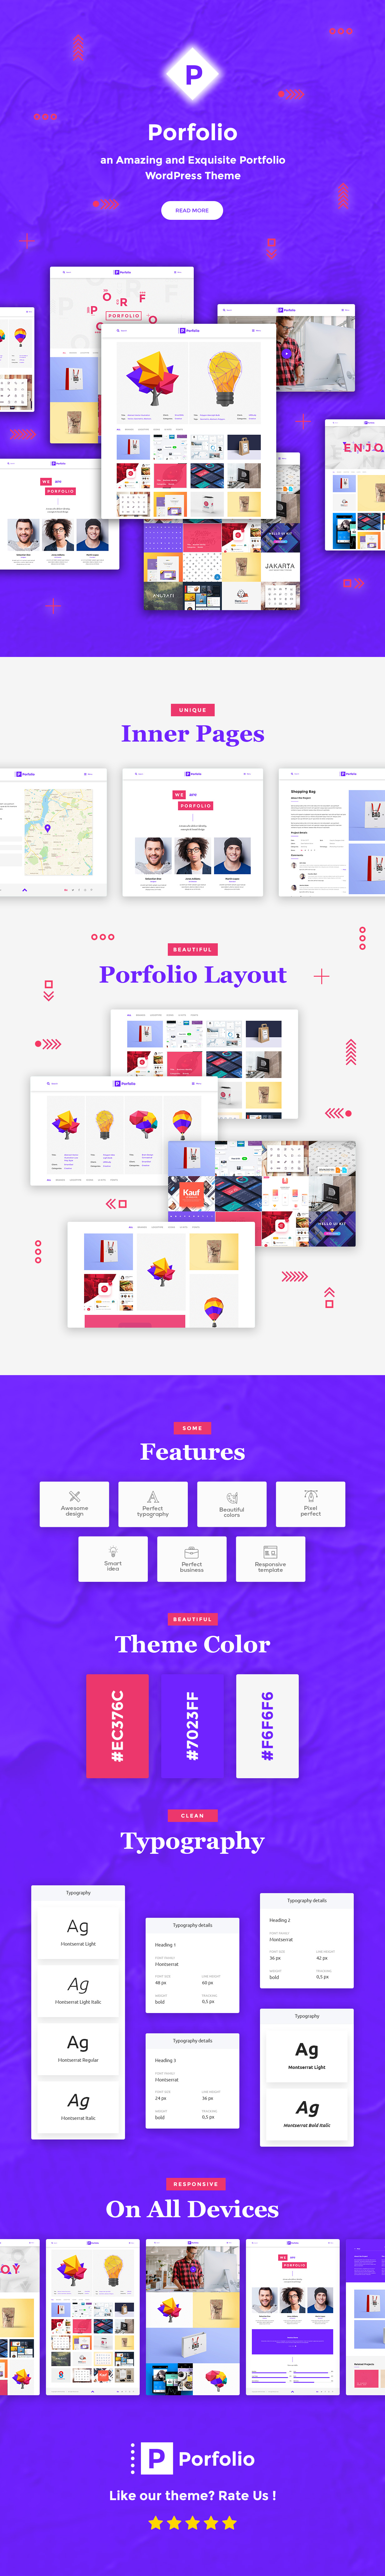 Porfolio - Creative Agency & Personal Portfolio WordPress Theme